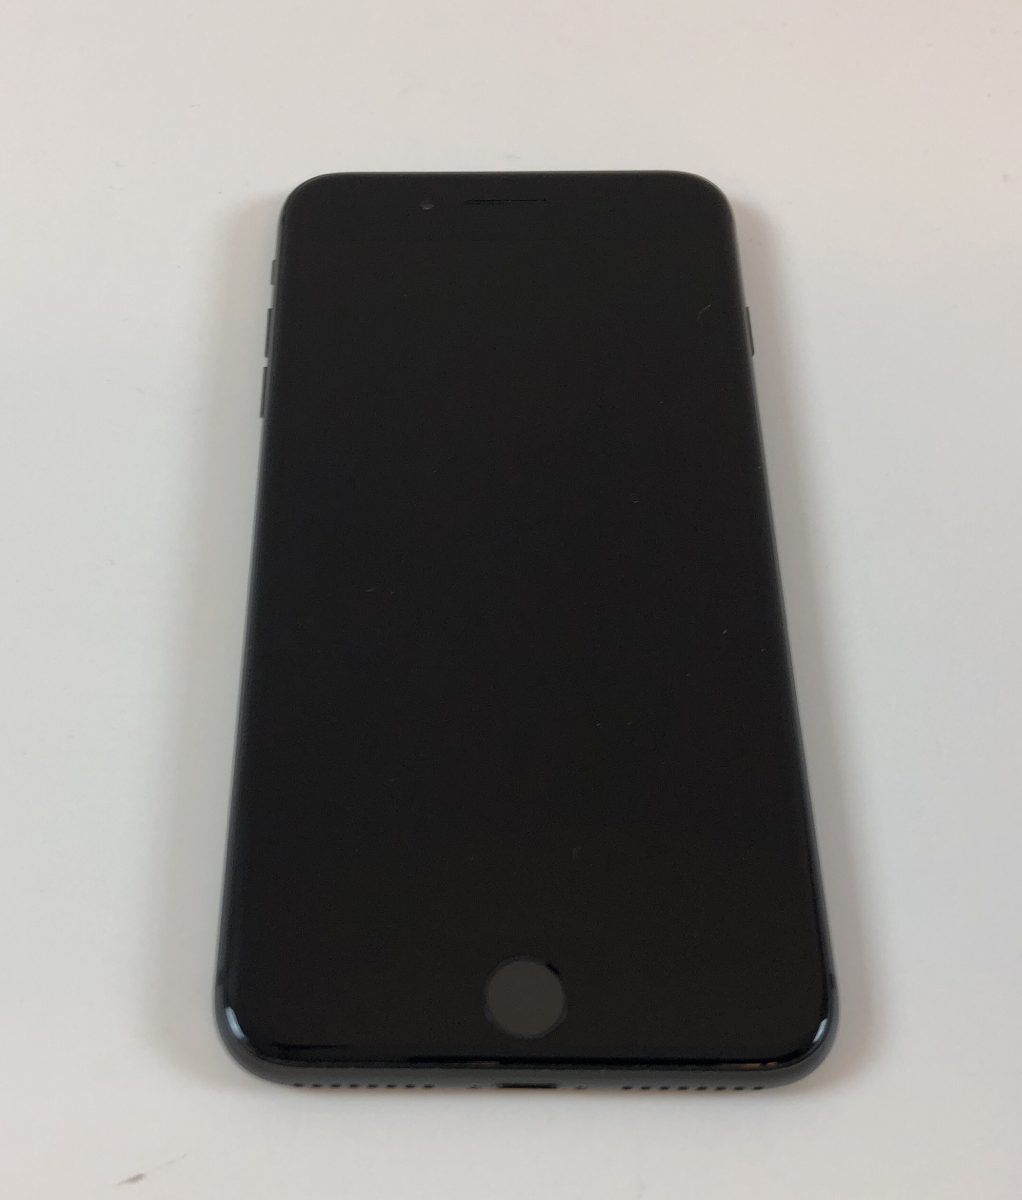 iPhone 8 Plus 64GB, 64GB, Space Gray, image 1